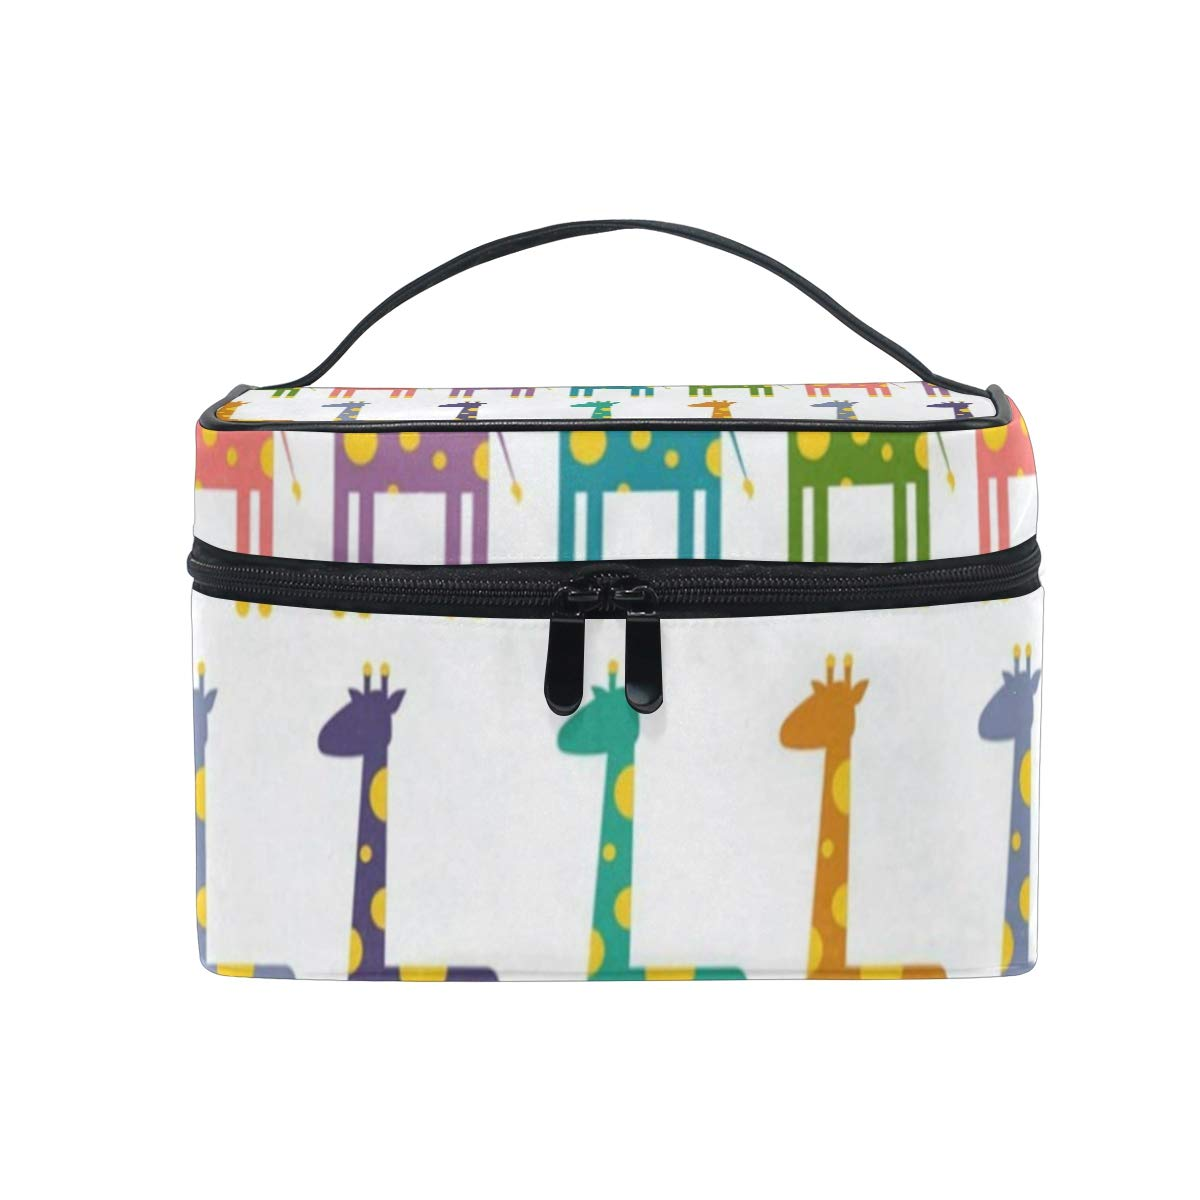 3dd5022aa86f Amazon.com : Makeup Bag Bright Colored Giraffes Cosmetic Bag ...